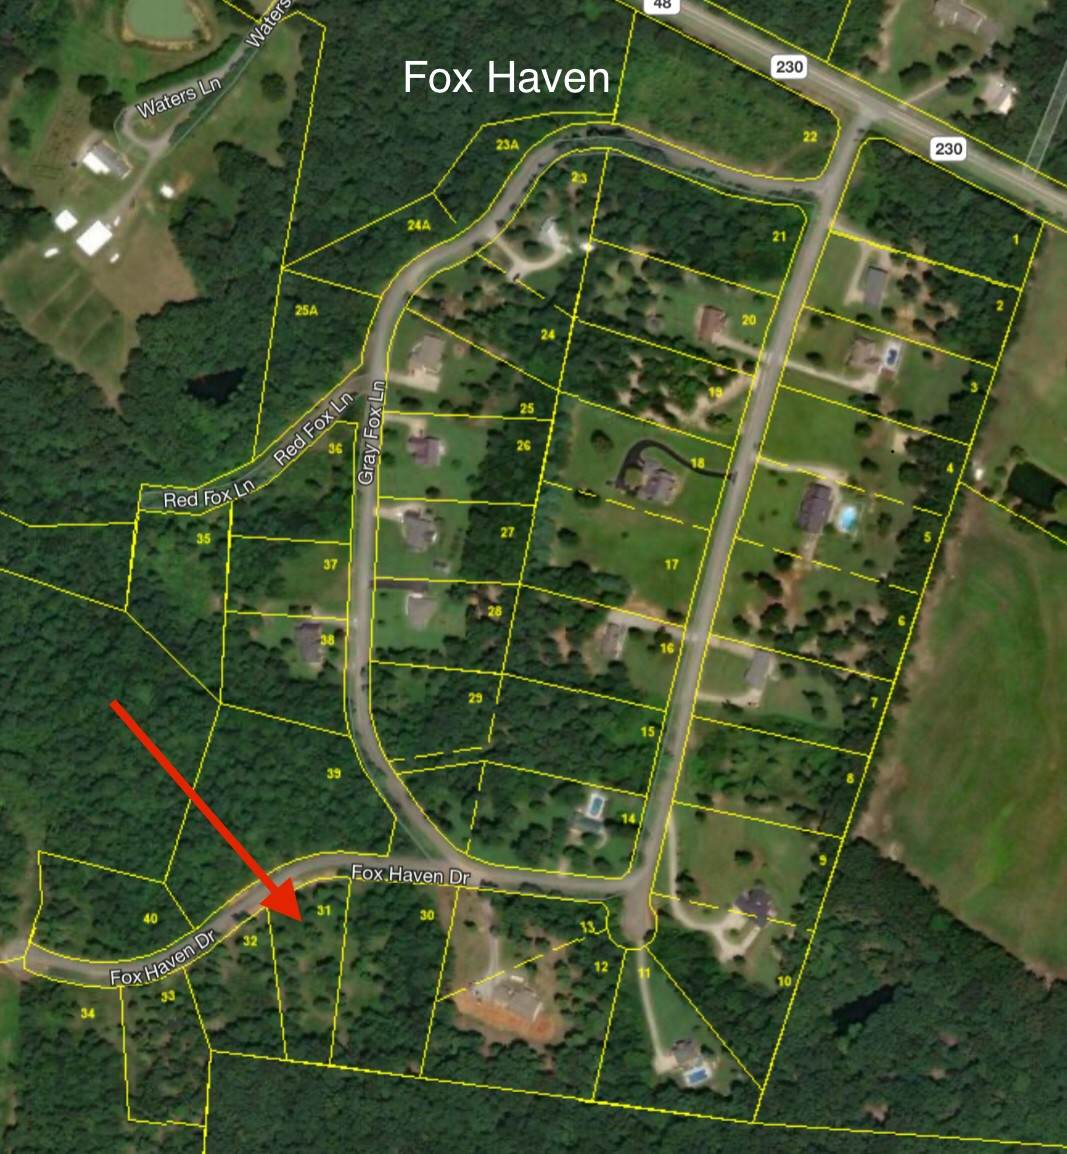 0 Fox Haven Dr - Photo 1